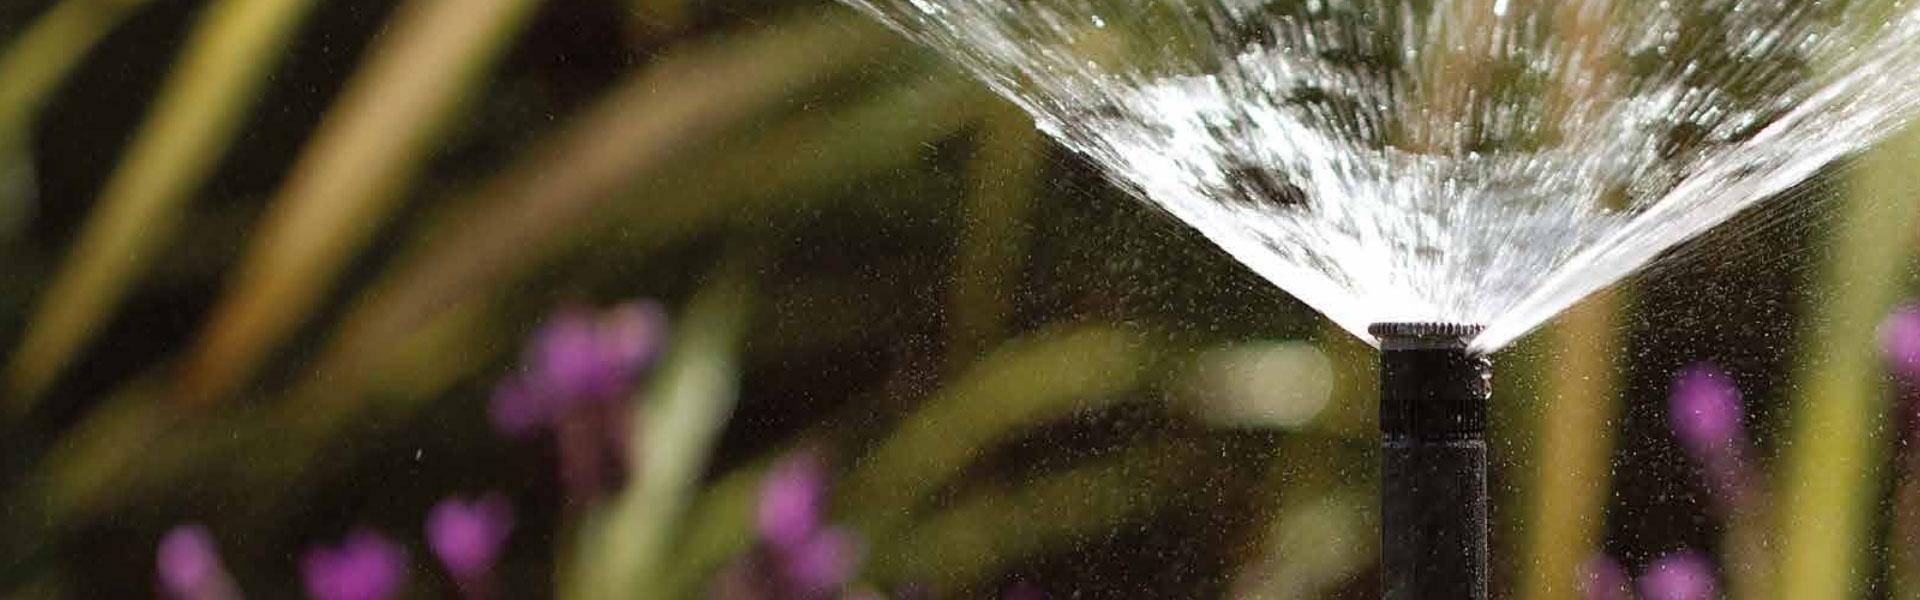 Mist Sprinkler Head Image